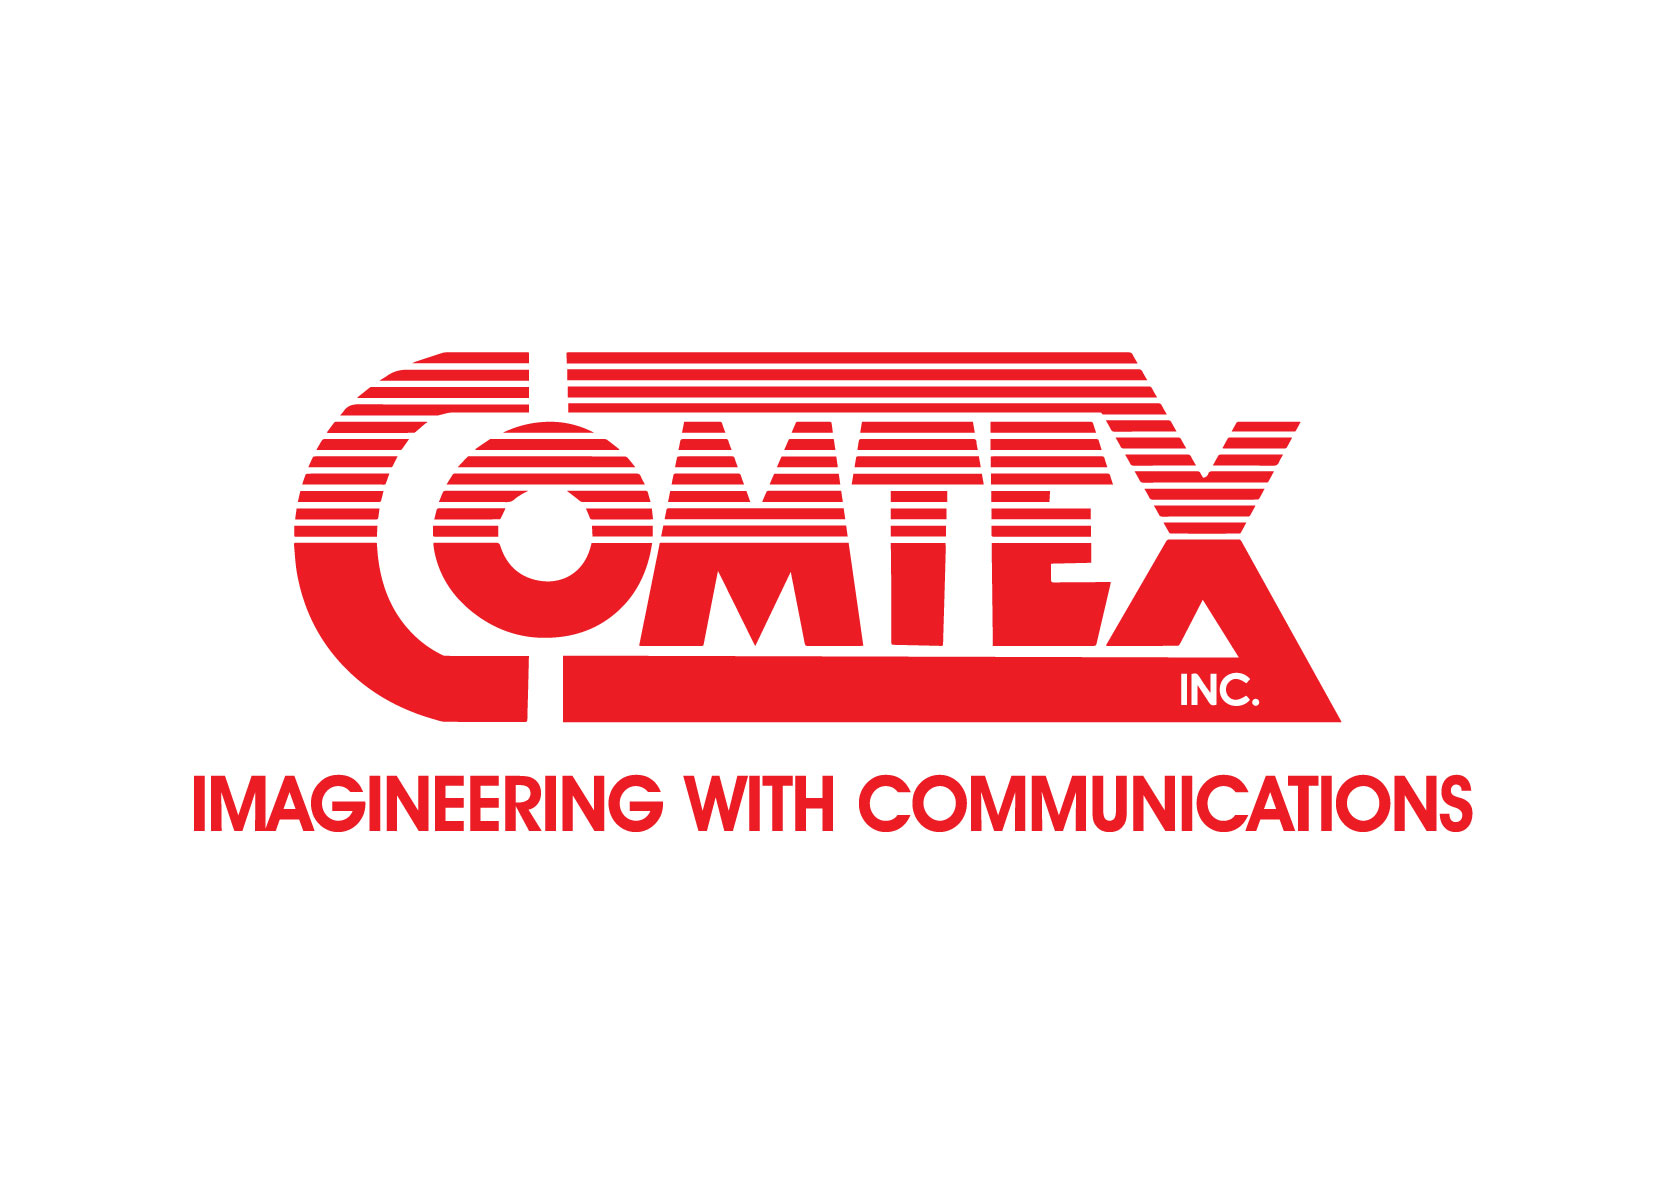 COMTEX-LOGO